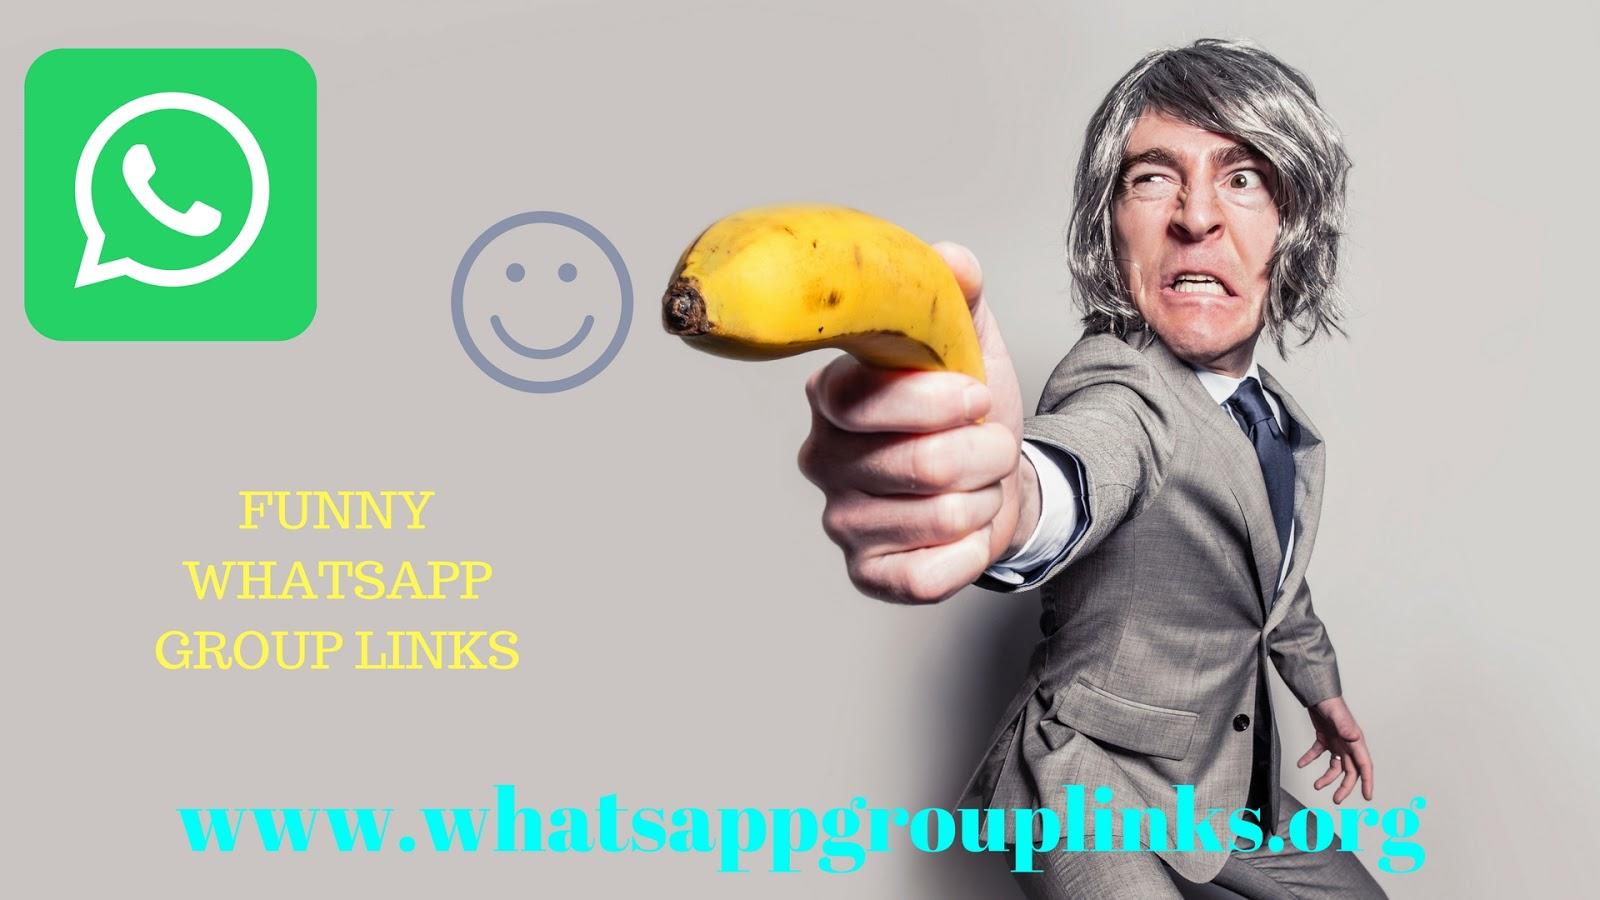 join funny WhatsApp group links list - Whatsapp Group Links